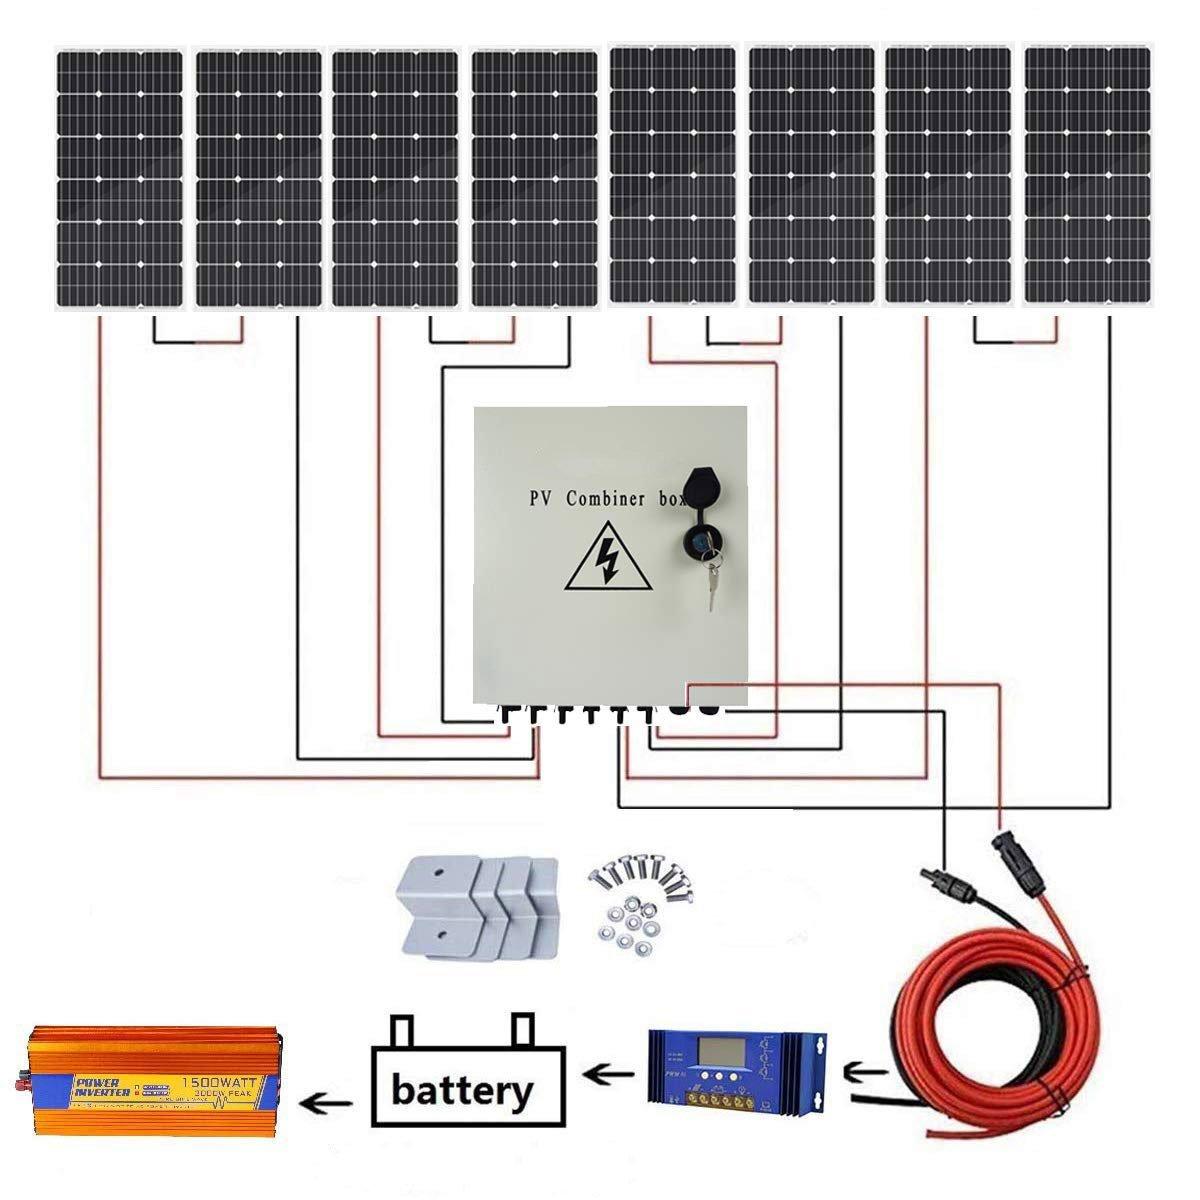 home solar installation, off grid solar power, pv system cost